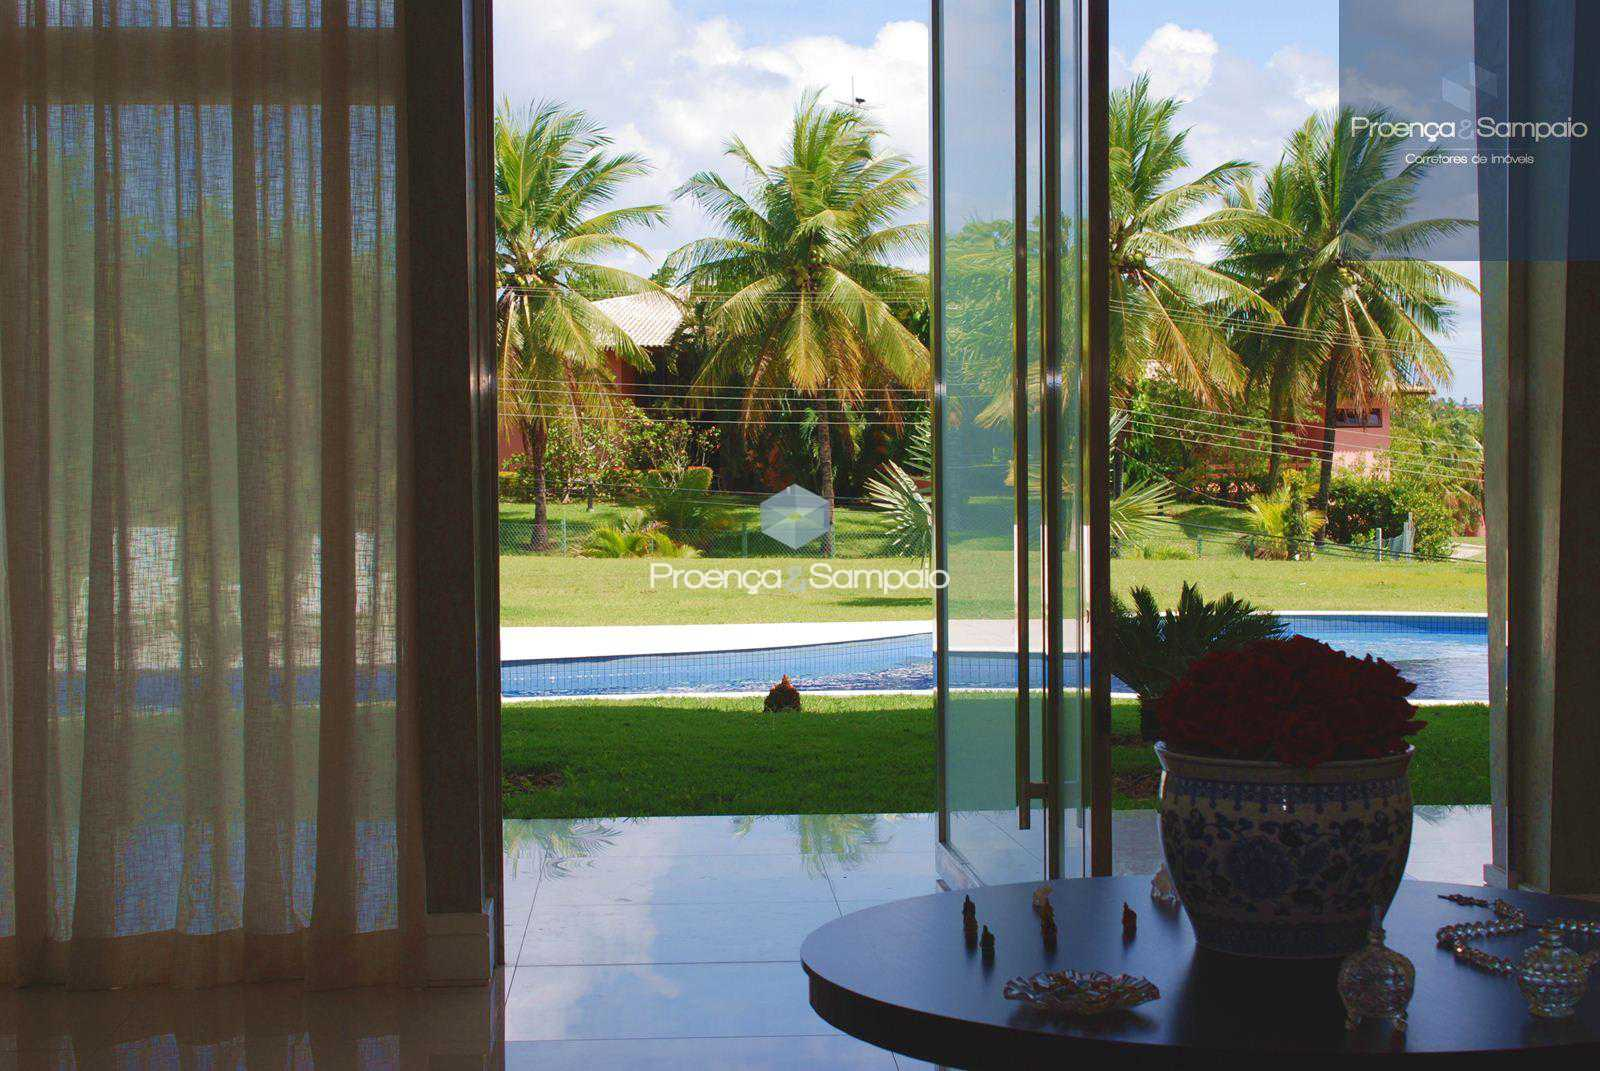 FOTO22 - Casa em Condomínio à venda Avenida Santos Dumont,Lauro de Freitas,BA - R$ 7.000.000 - PSCN50005 - 24